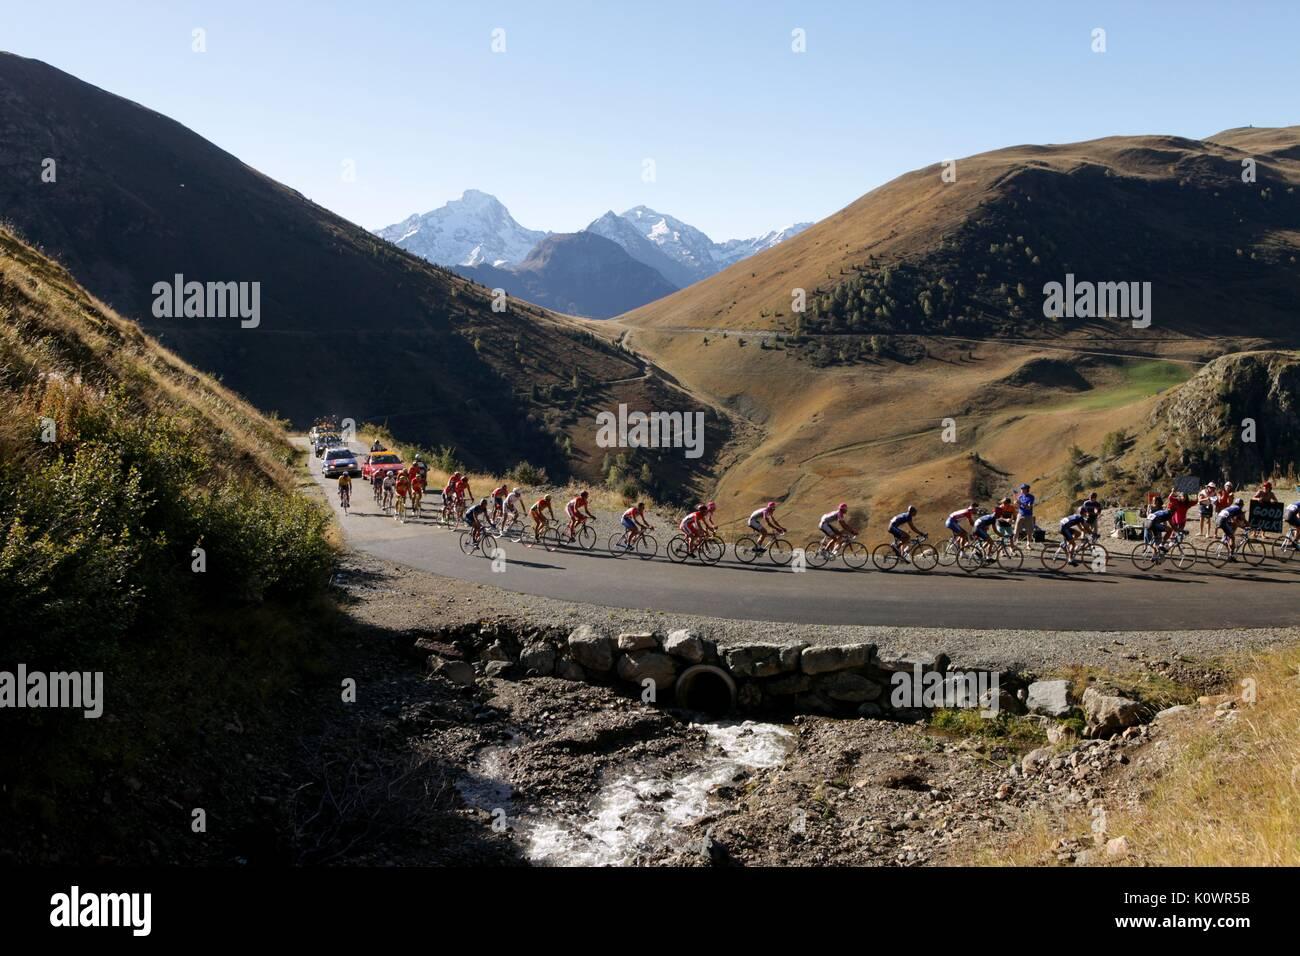 CYCLE RACE THE PROGRAM (2015) - Stock Image